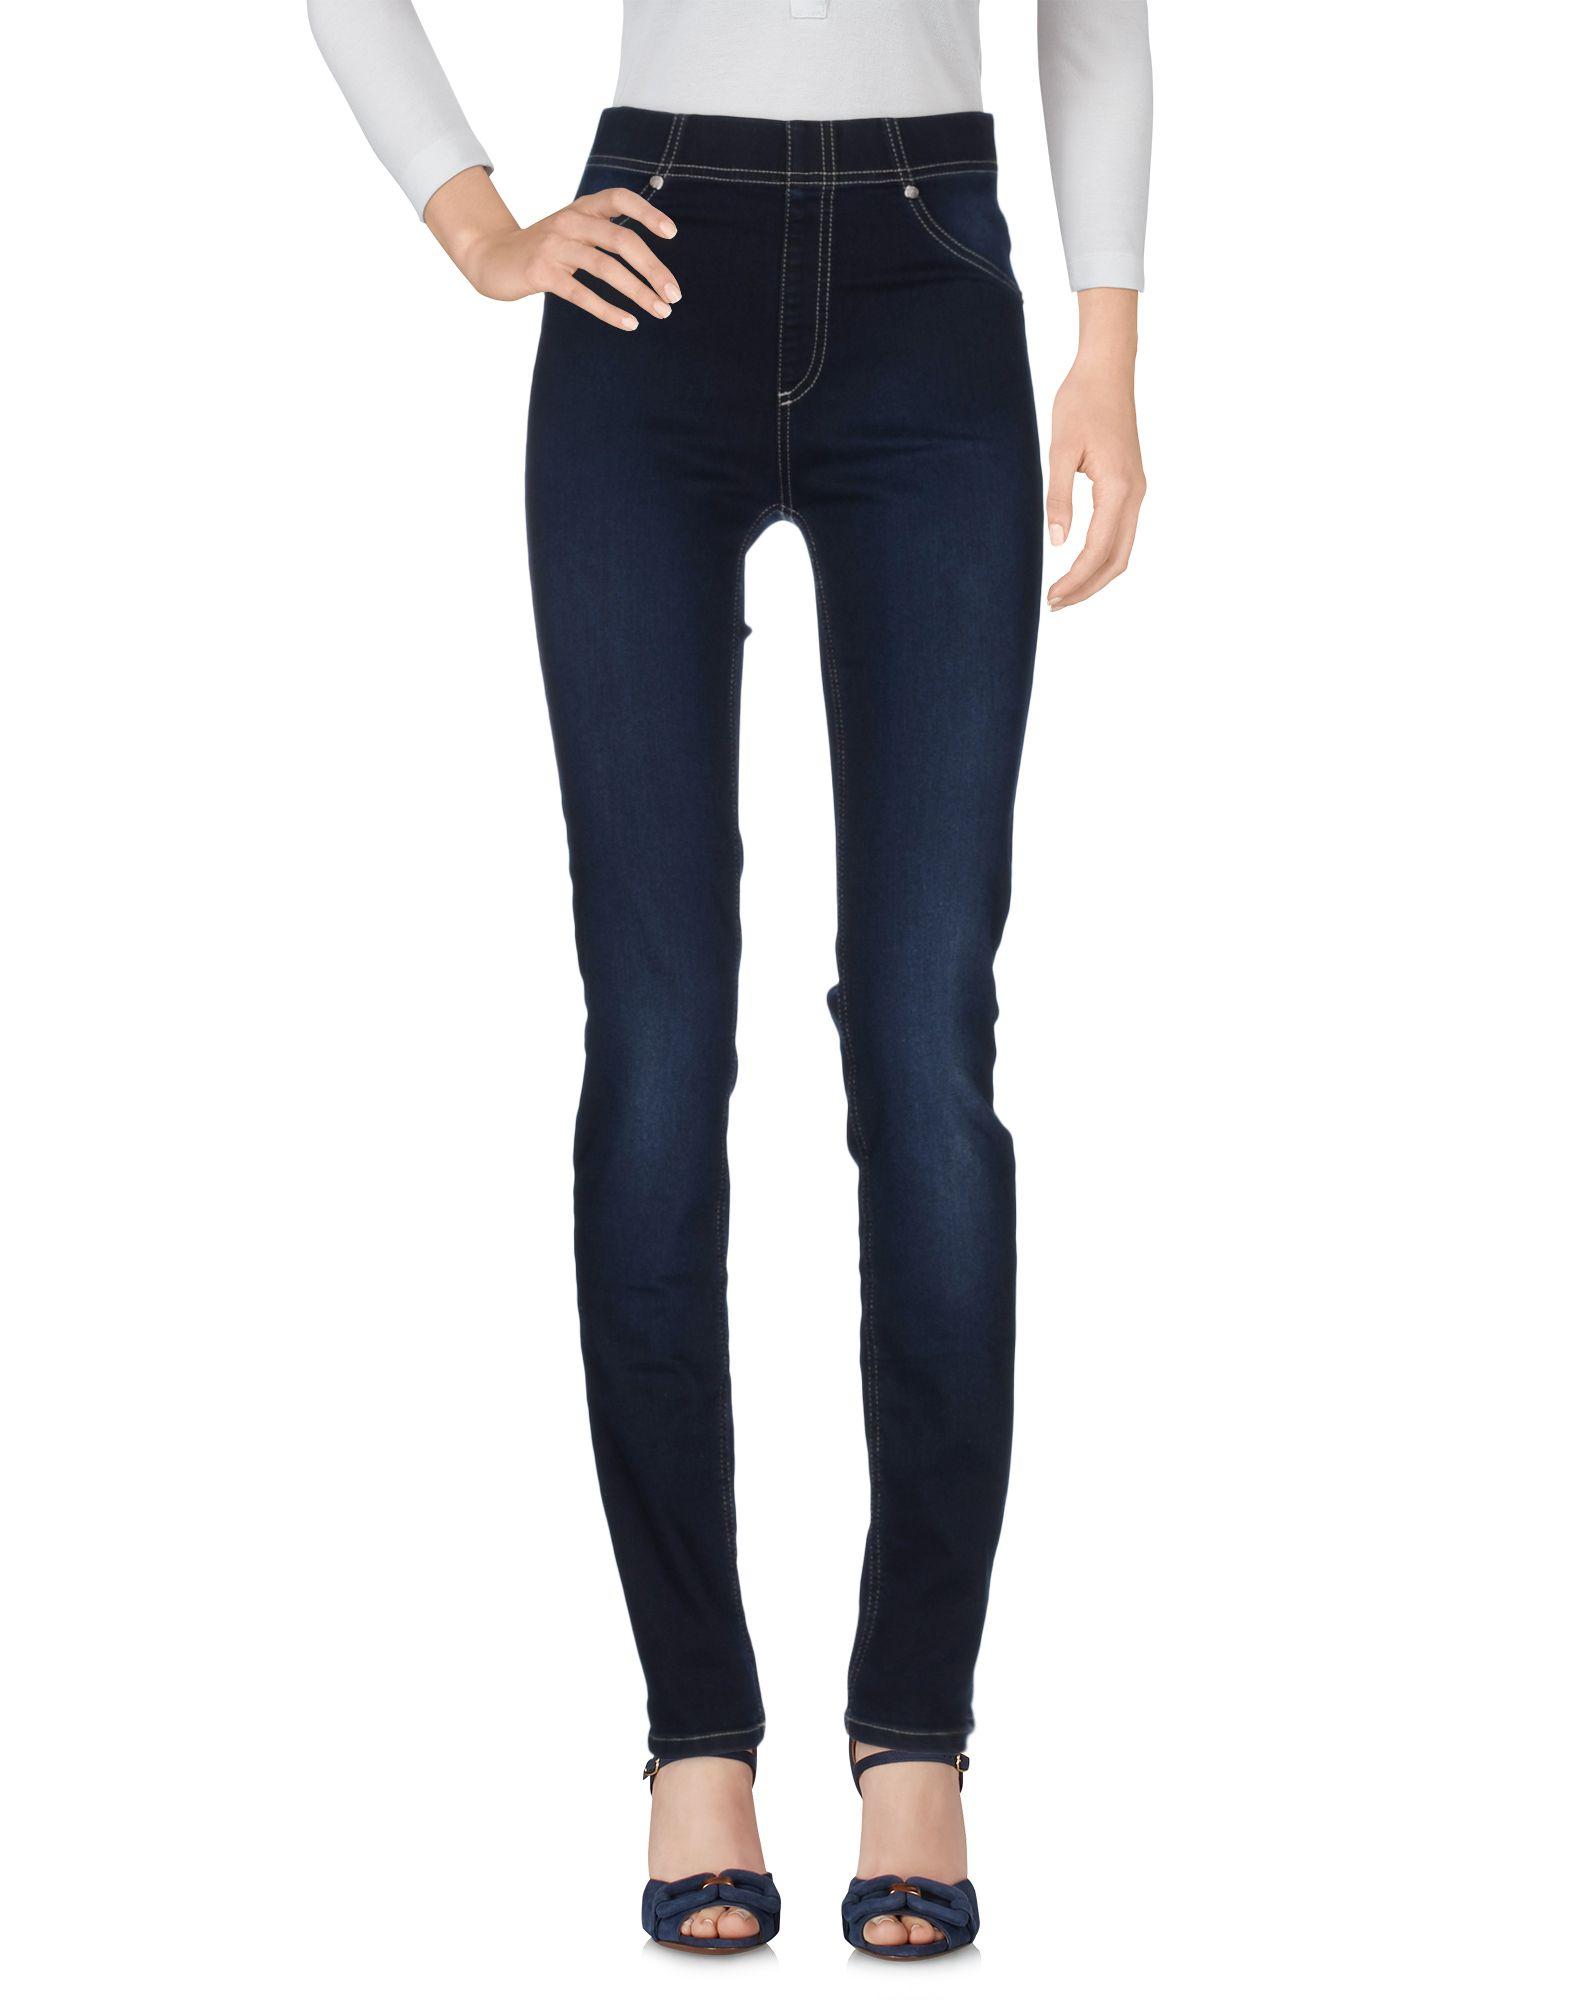 Pantaloni Jeans Civit donna donna donna - 42593767RN 6e5